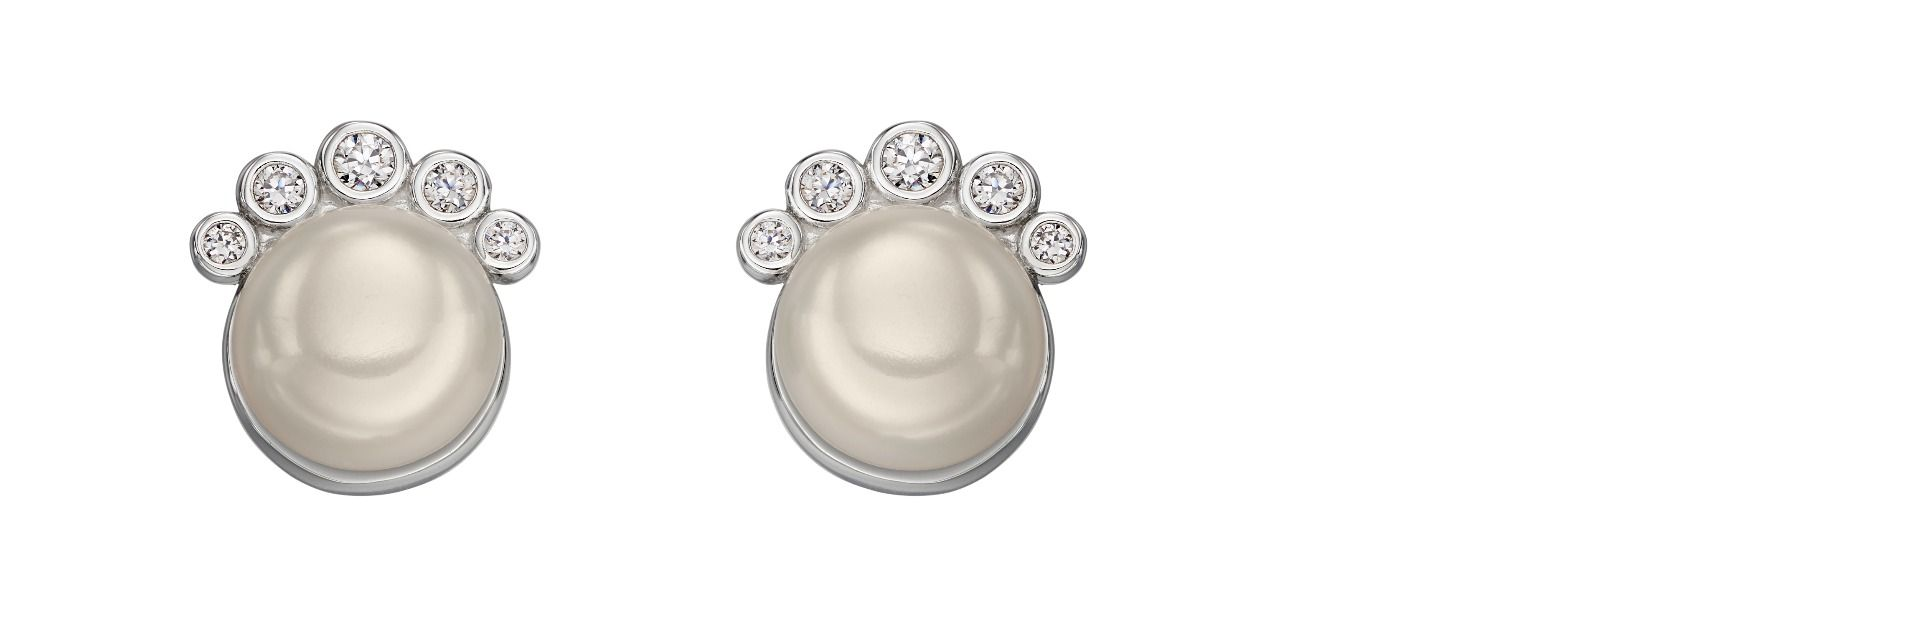 Elements Silver Womens 925 Sterling Silver Freshwater Pearl & Cubic Zirconia Round Stud Earrings E5678W